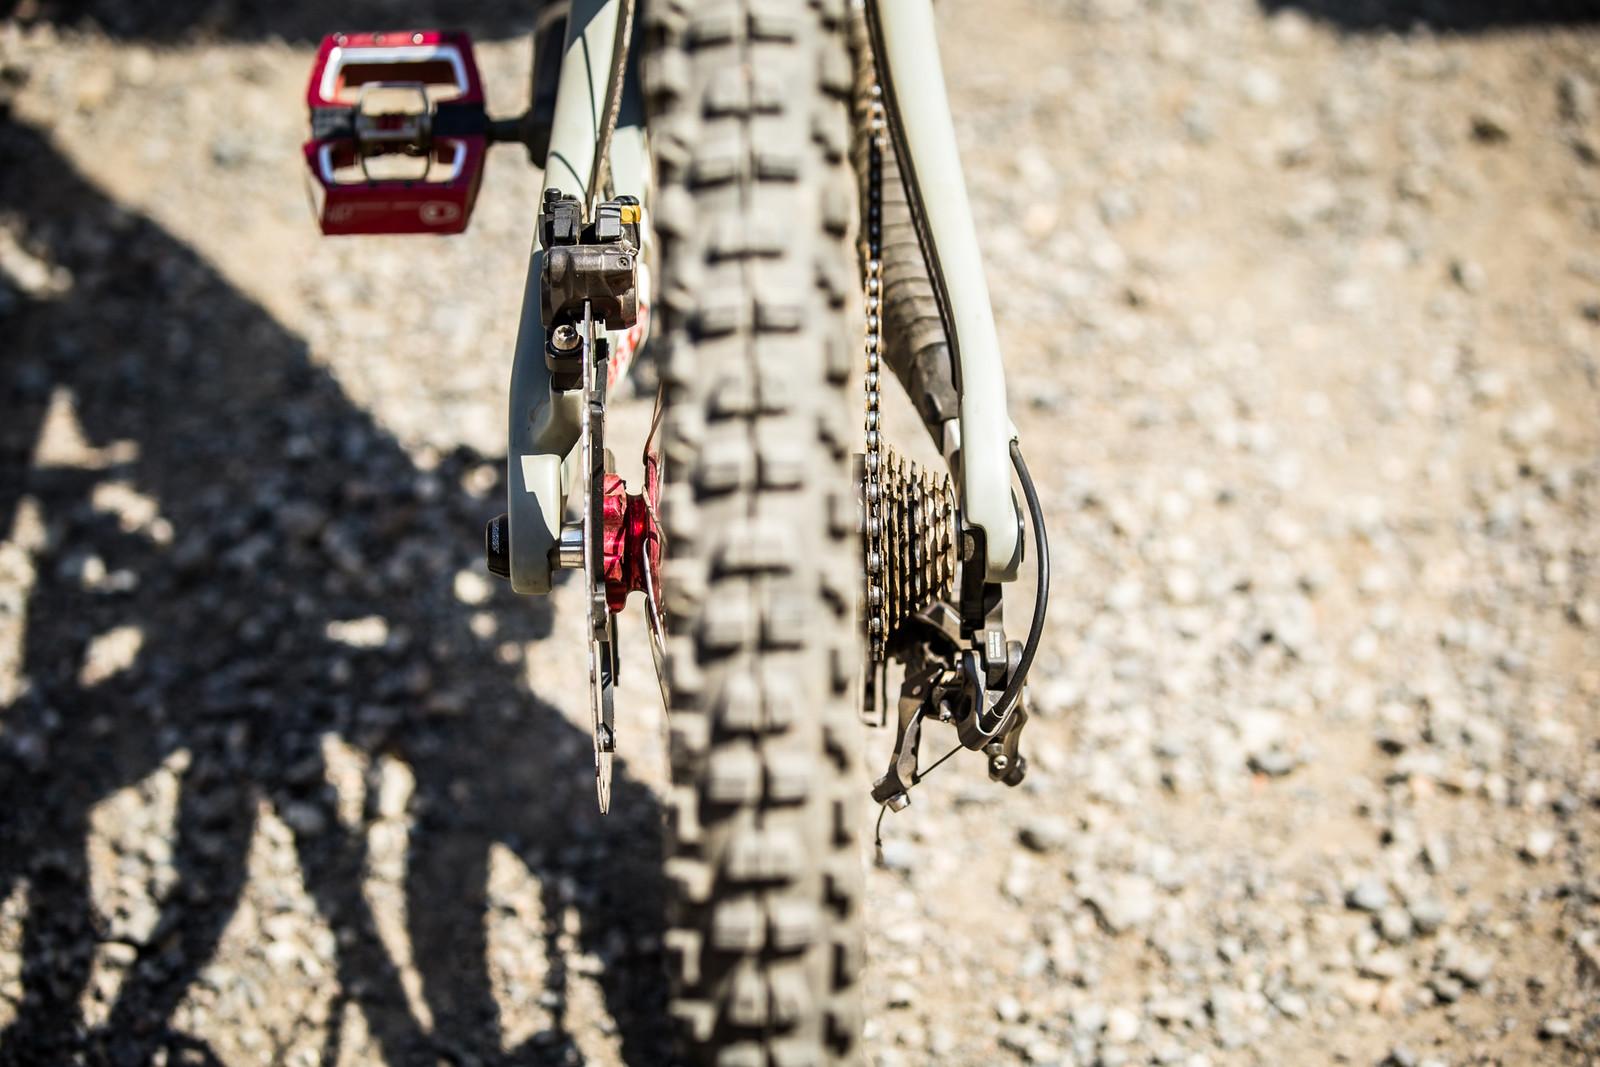 Rear Components - WINNING BIKE - Loris Vergier's Santa Cruz V10cc 29 - Mountain Biking Pictures - Vital MTB